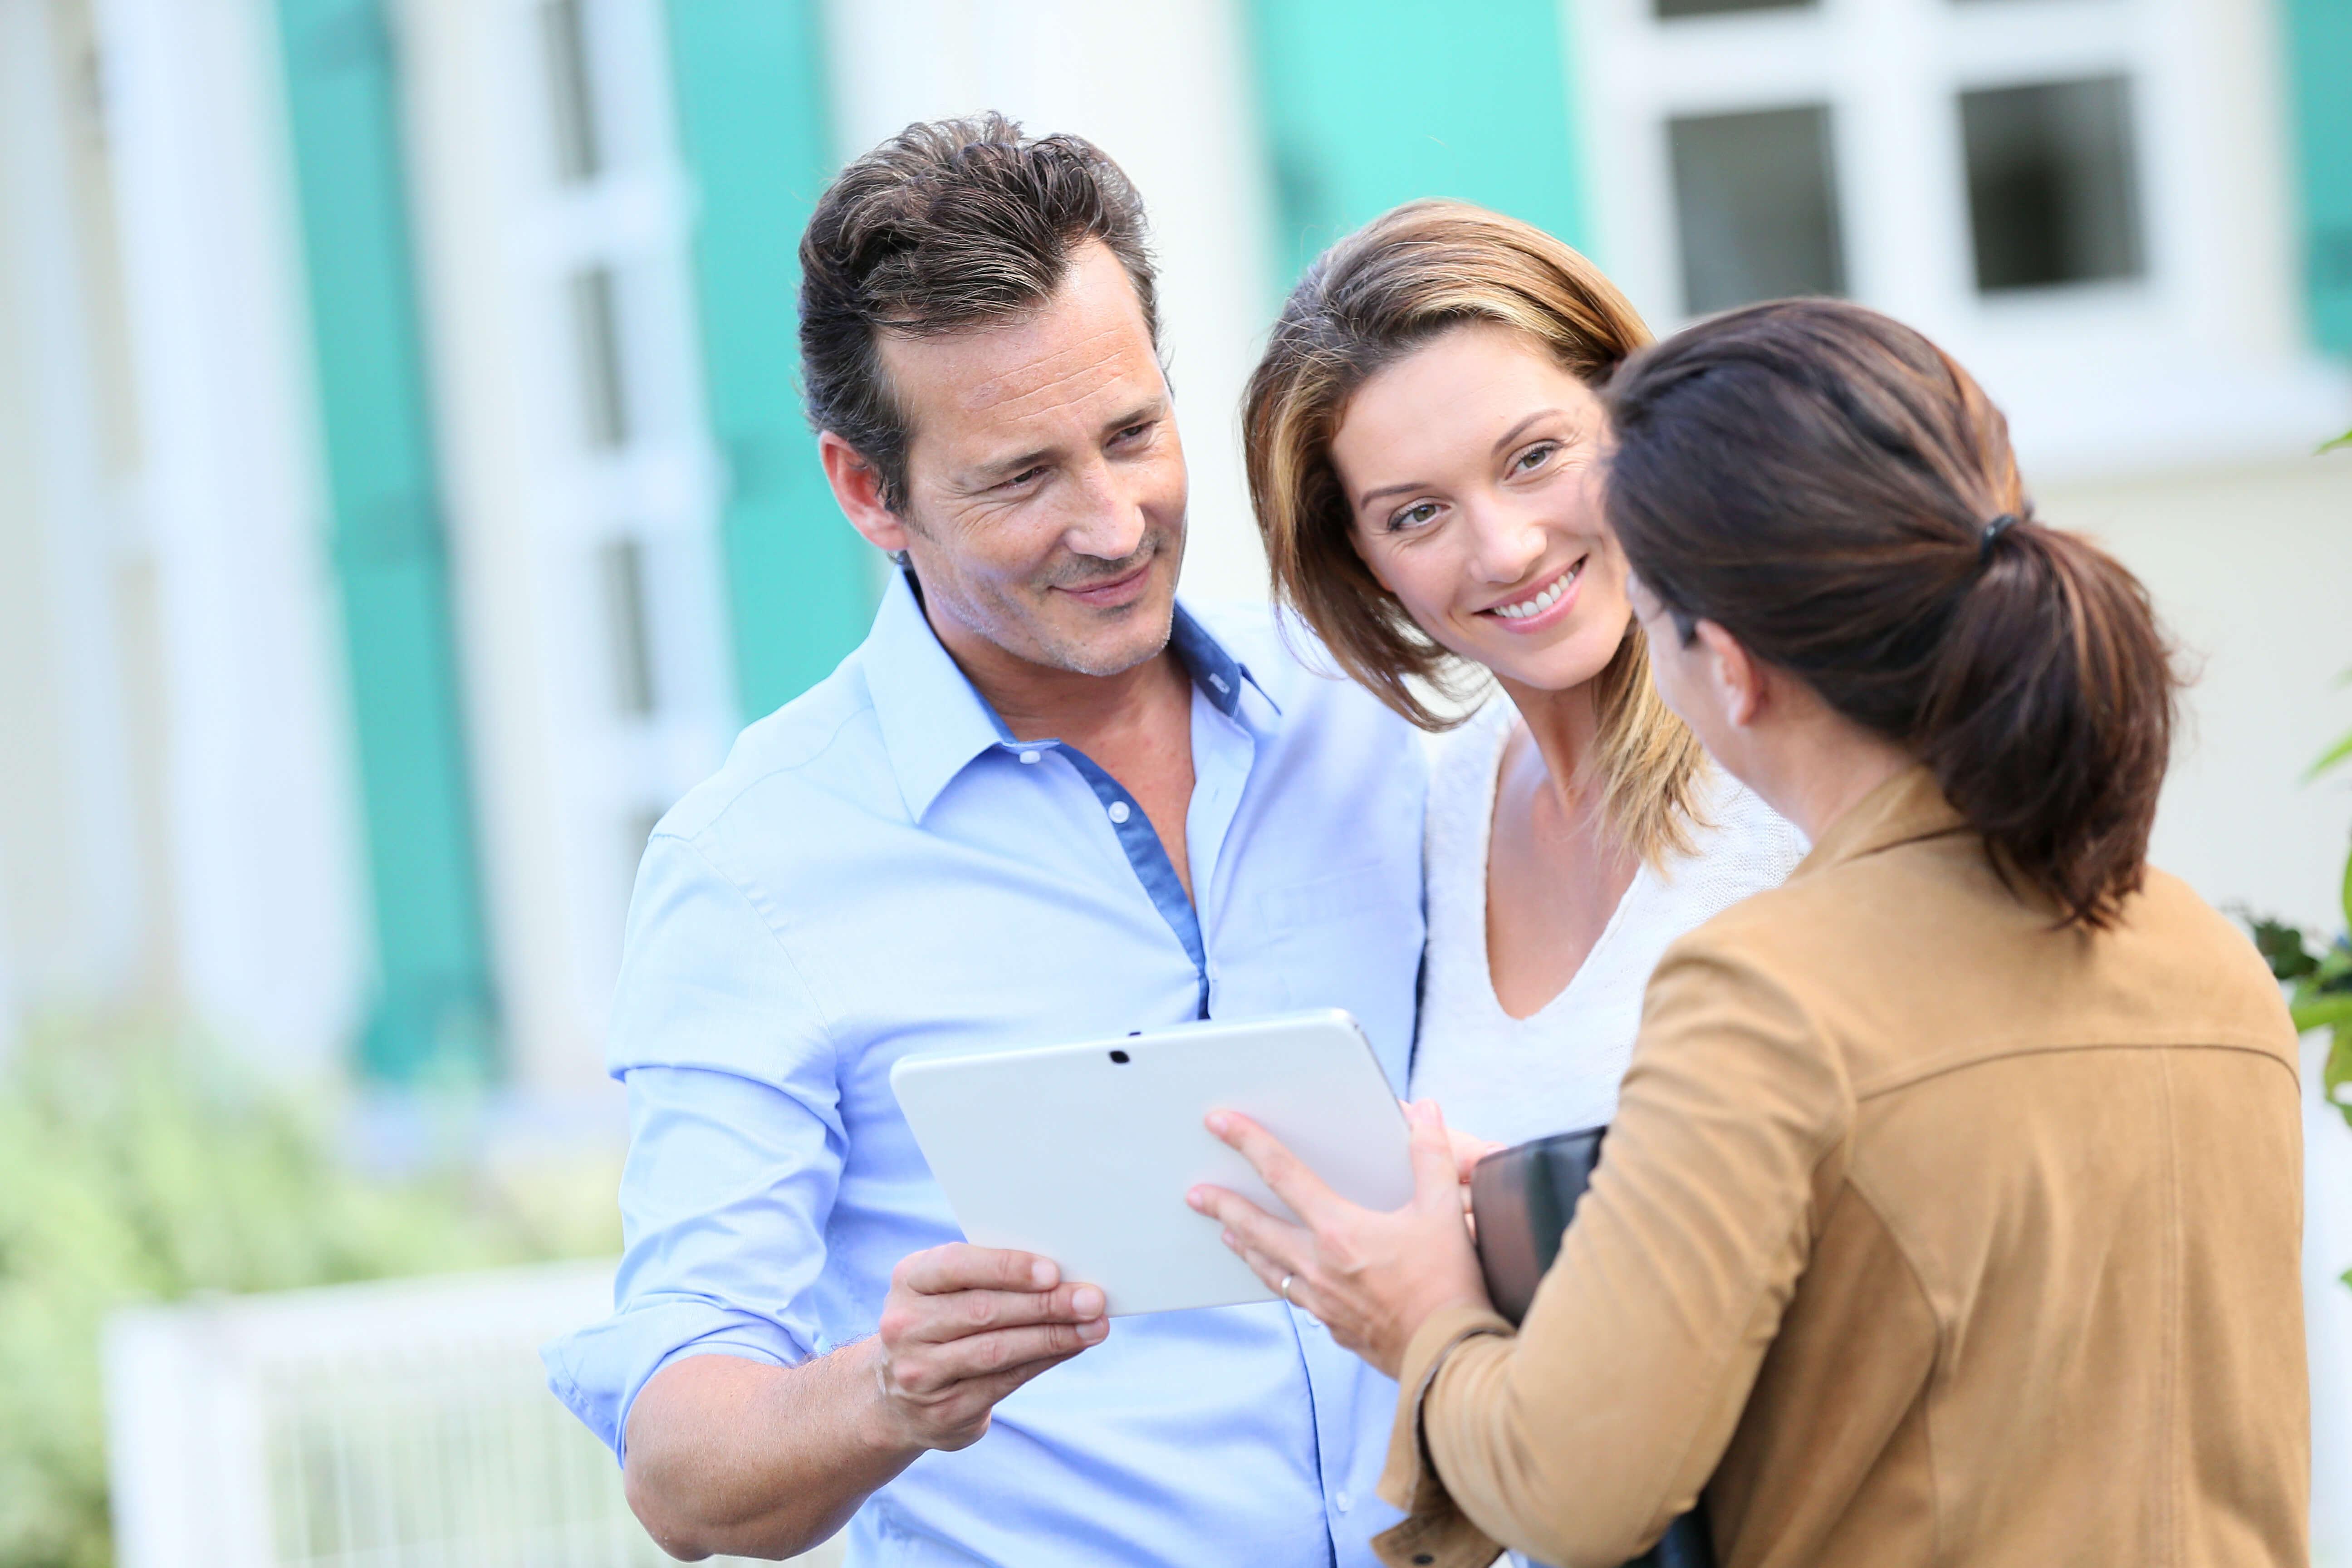 Inside Your Agent's Mind: Strike a Partnership